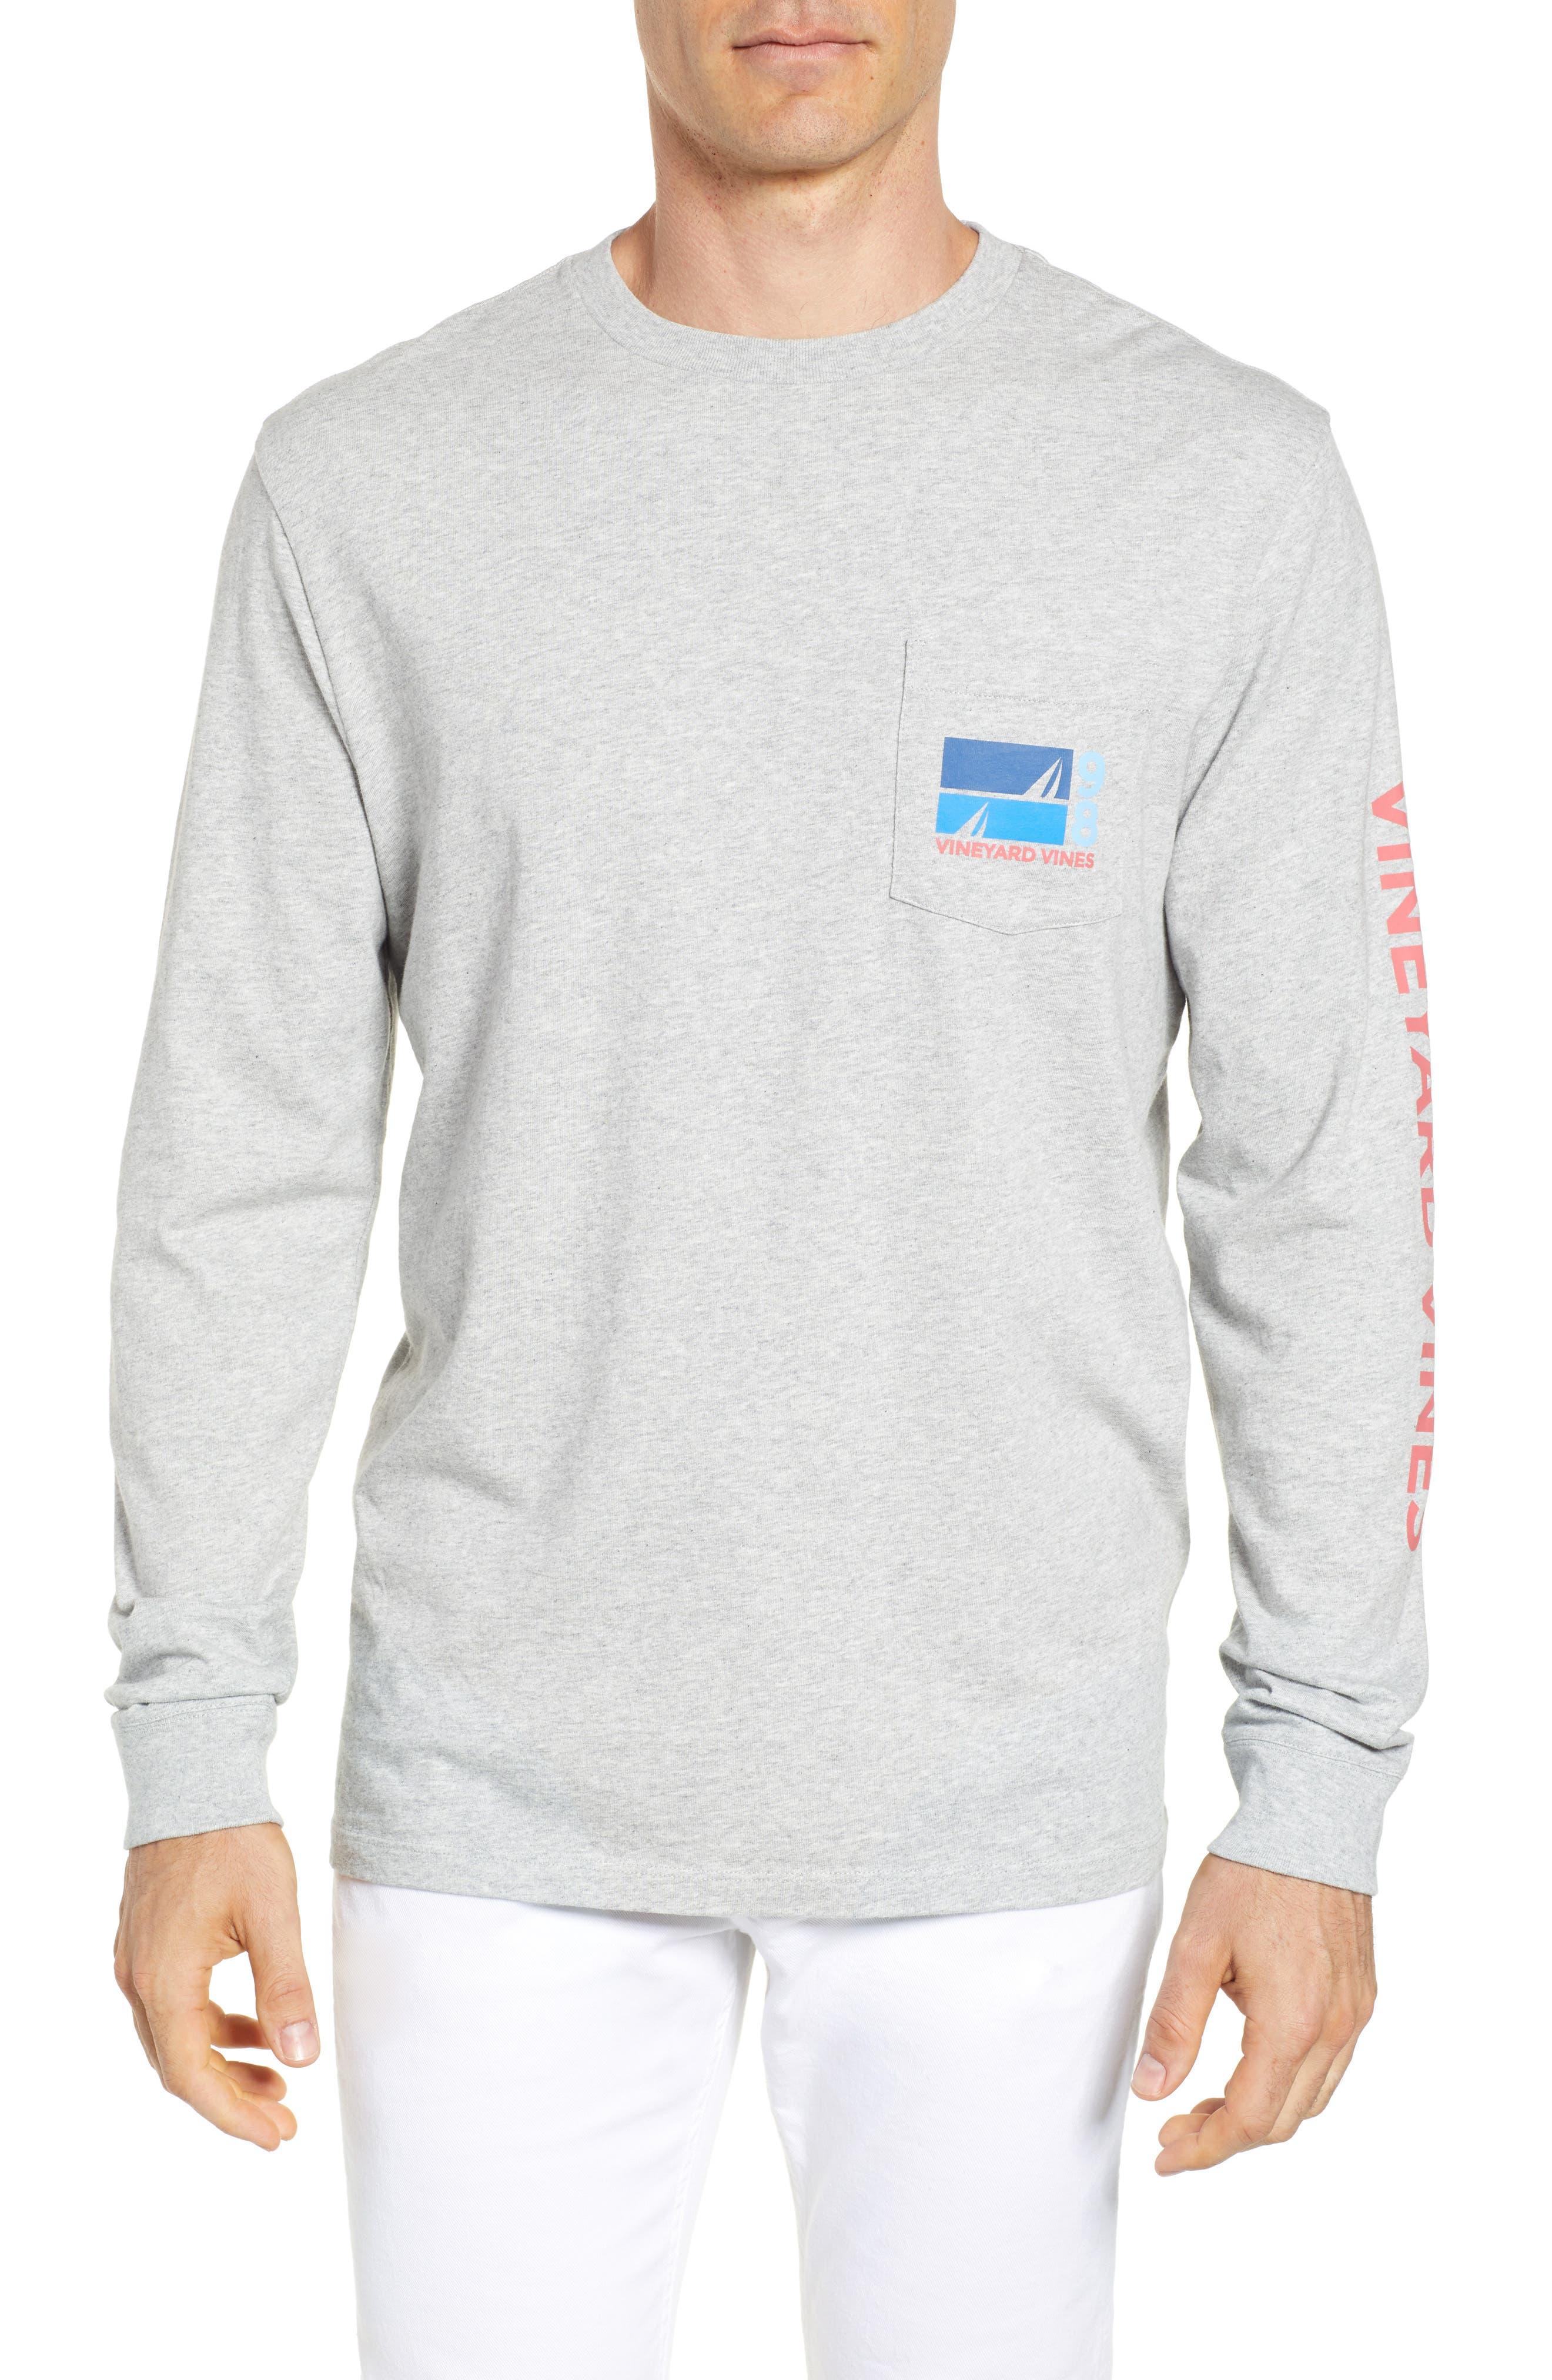 VINEYARD VINES Sailing Blue Regular Fit Crewneck T-Shirt, Main, color, 039